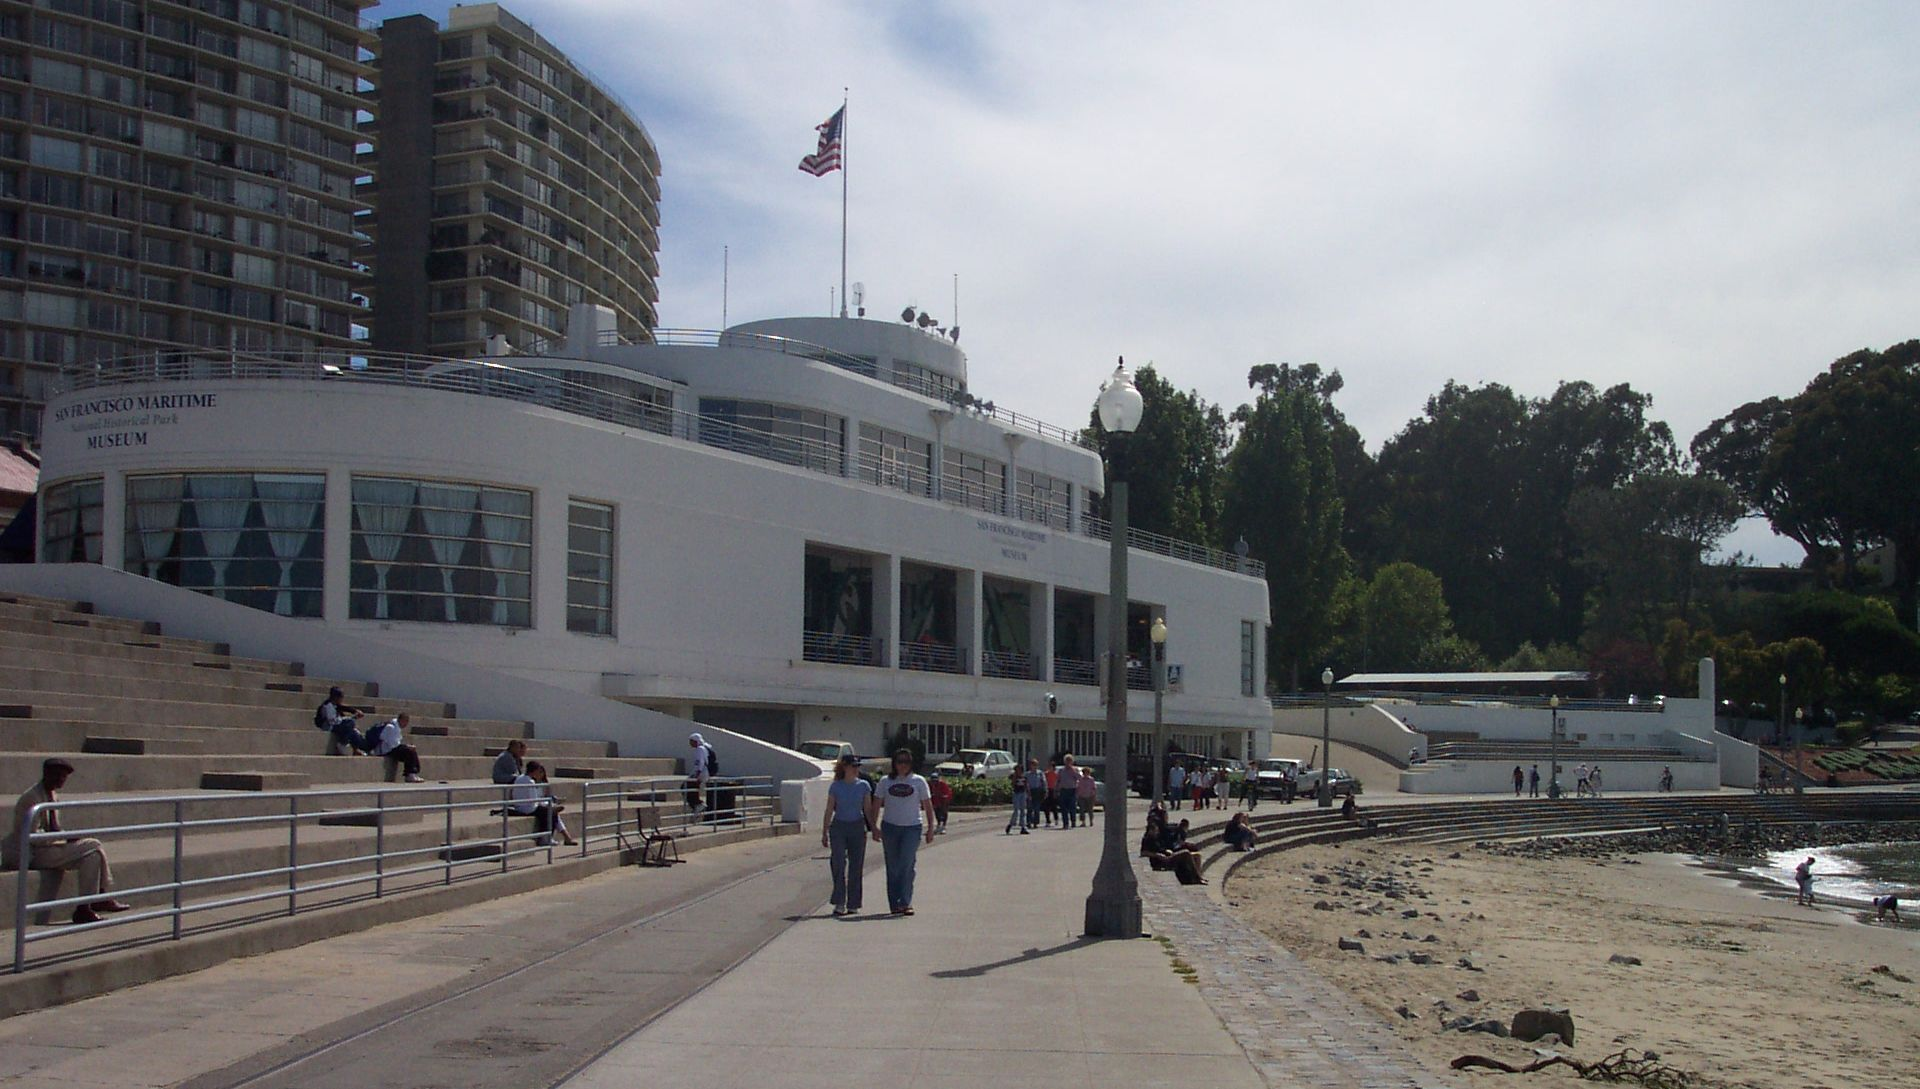 San_Francisco_Maritime_Museum.jpg